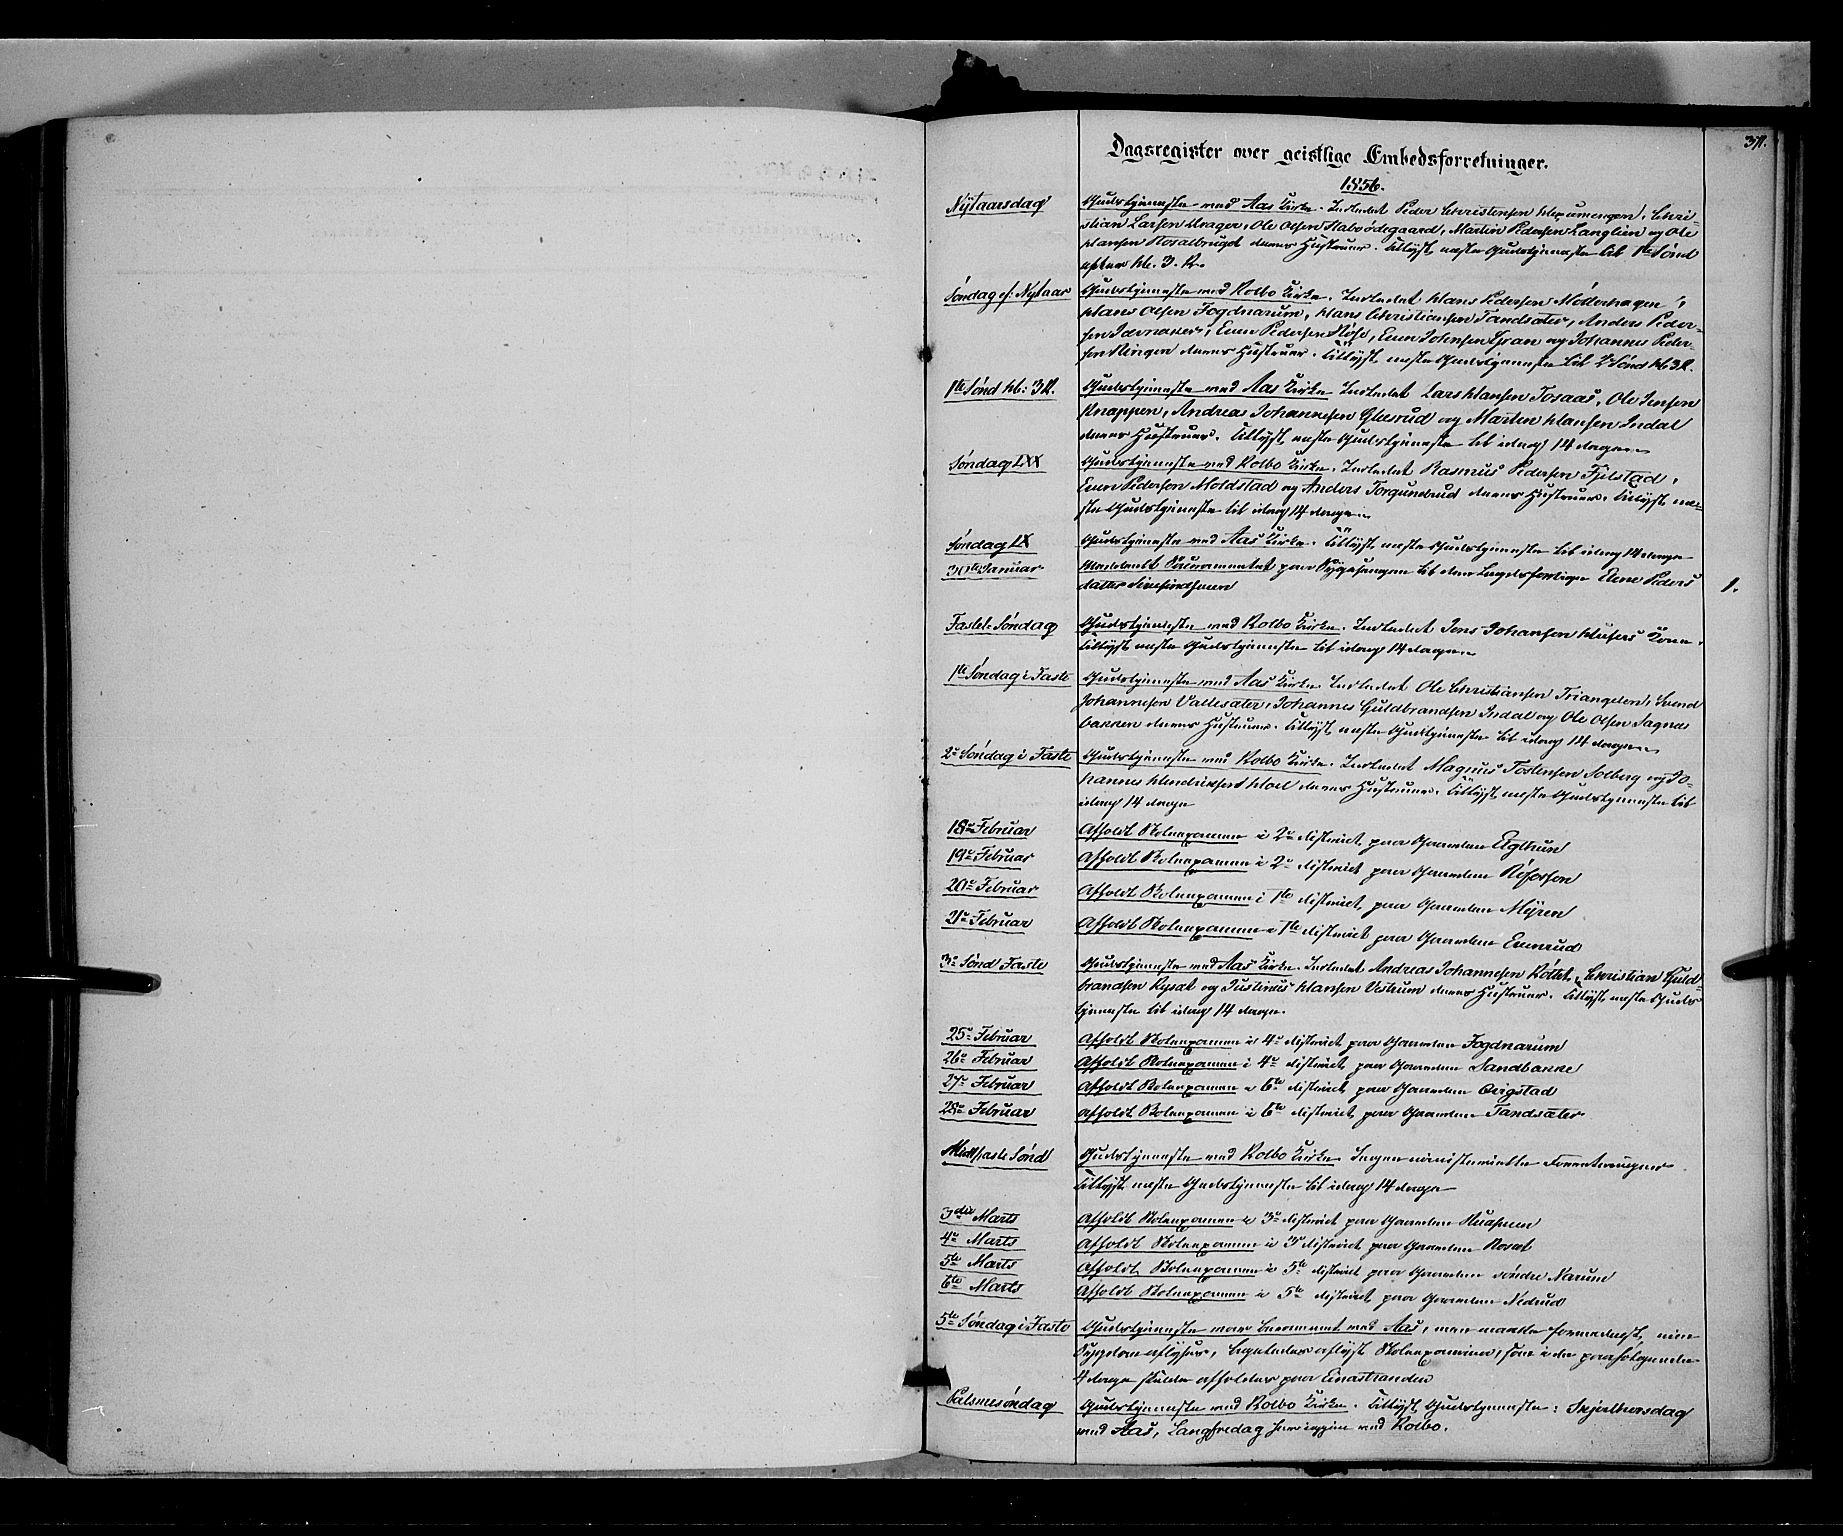 SAH, Vestre Toten prestekontor, H/Ha/Haa/L0006: Ministerialbok nr. 6, 1856-1861, s. 371